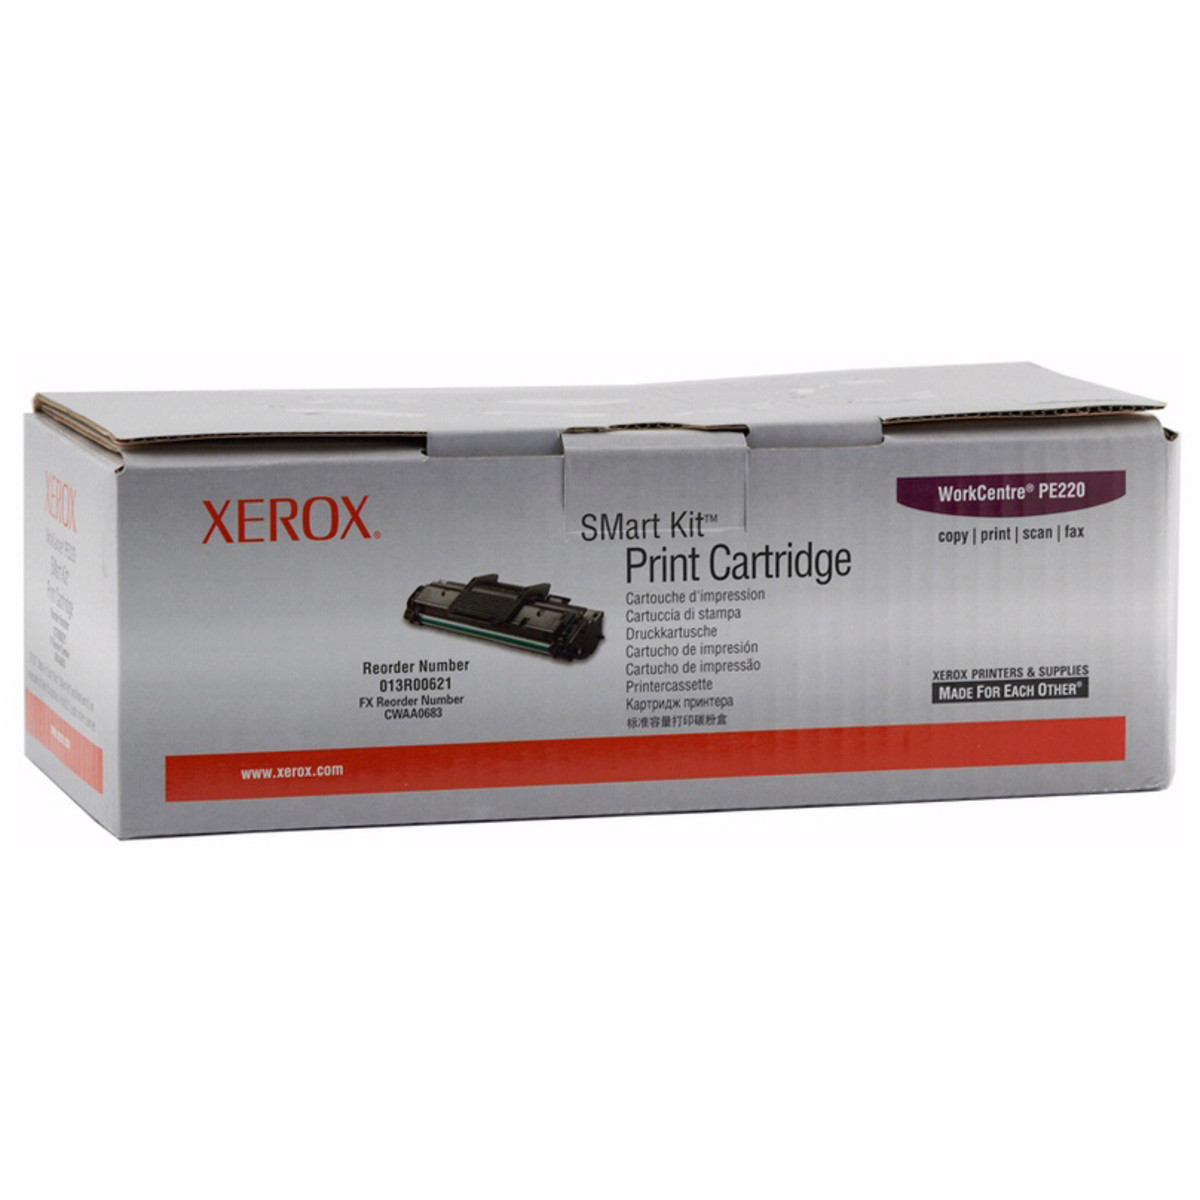 Xerox CWAA0683 Black Toner Cartridge